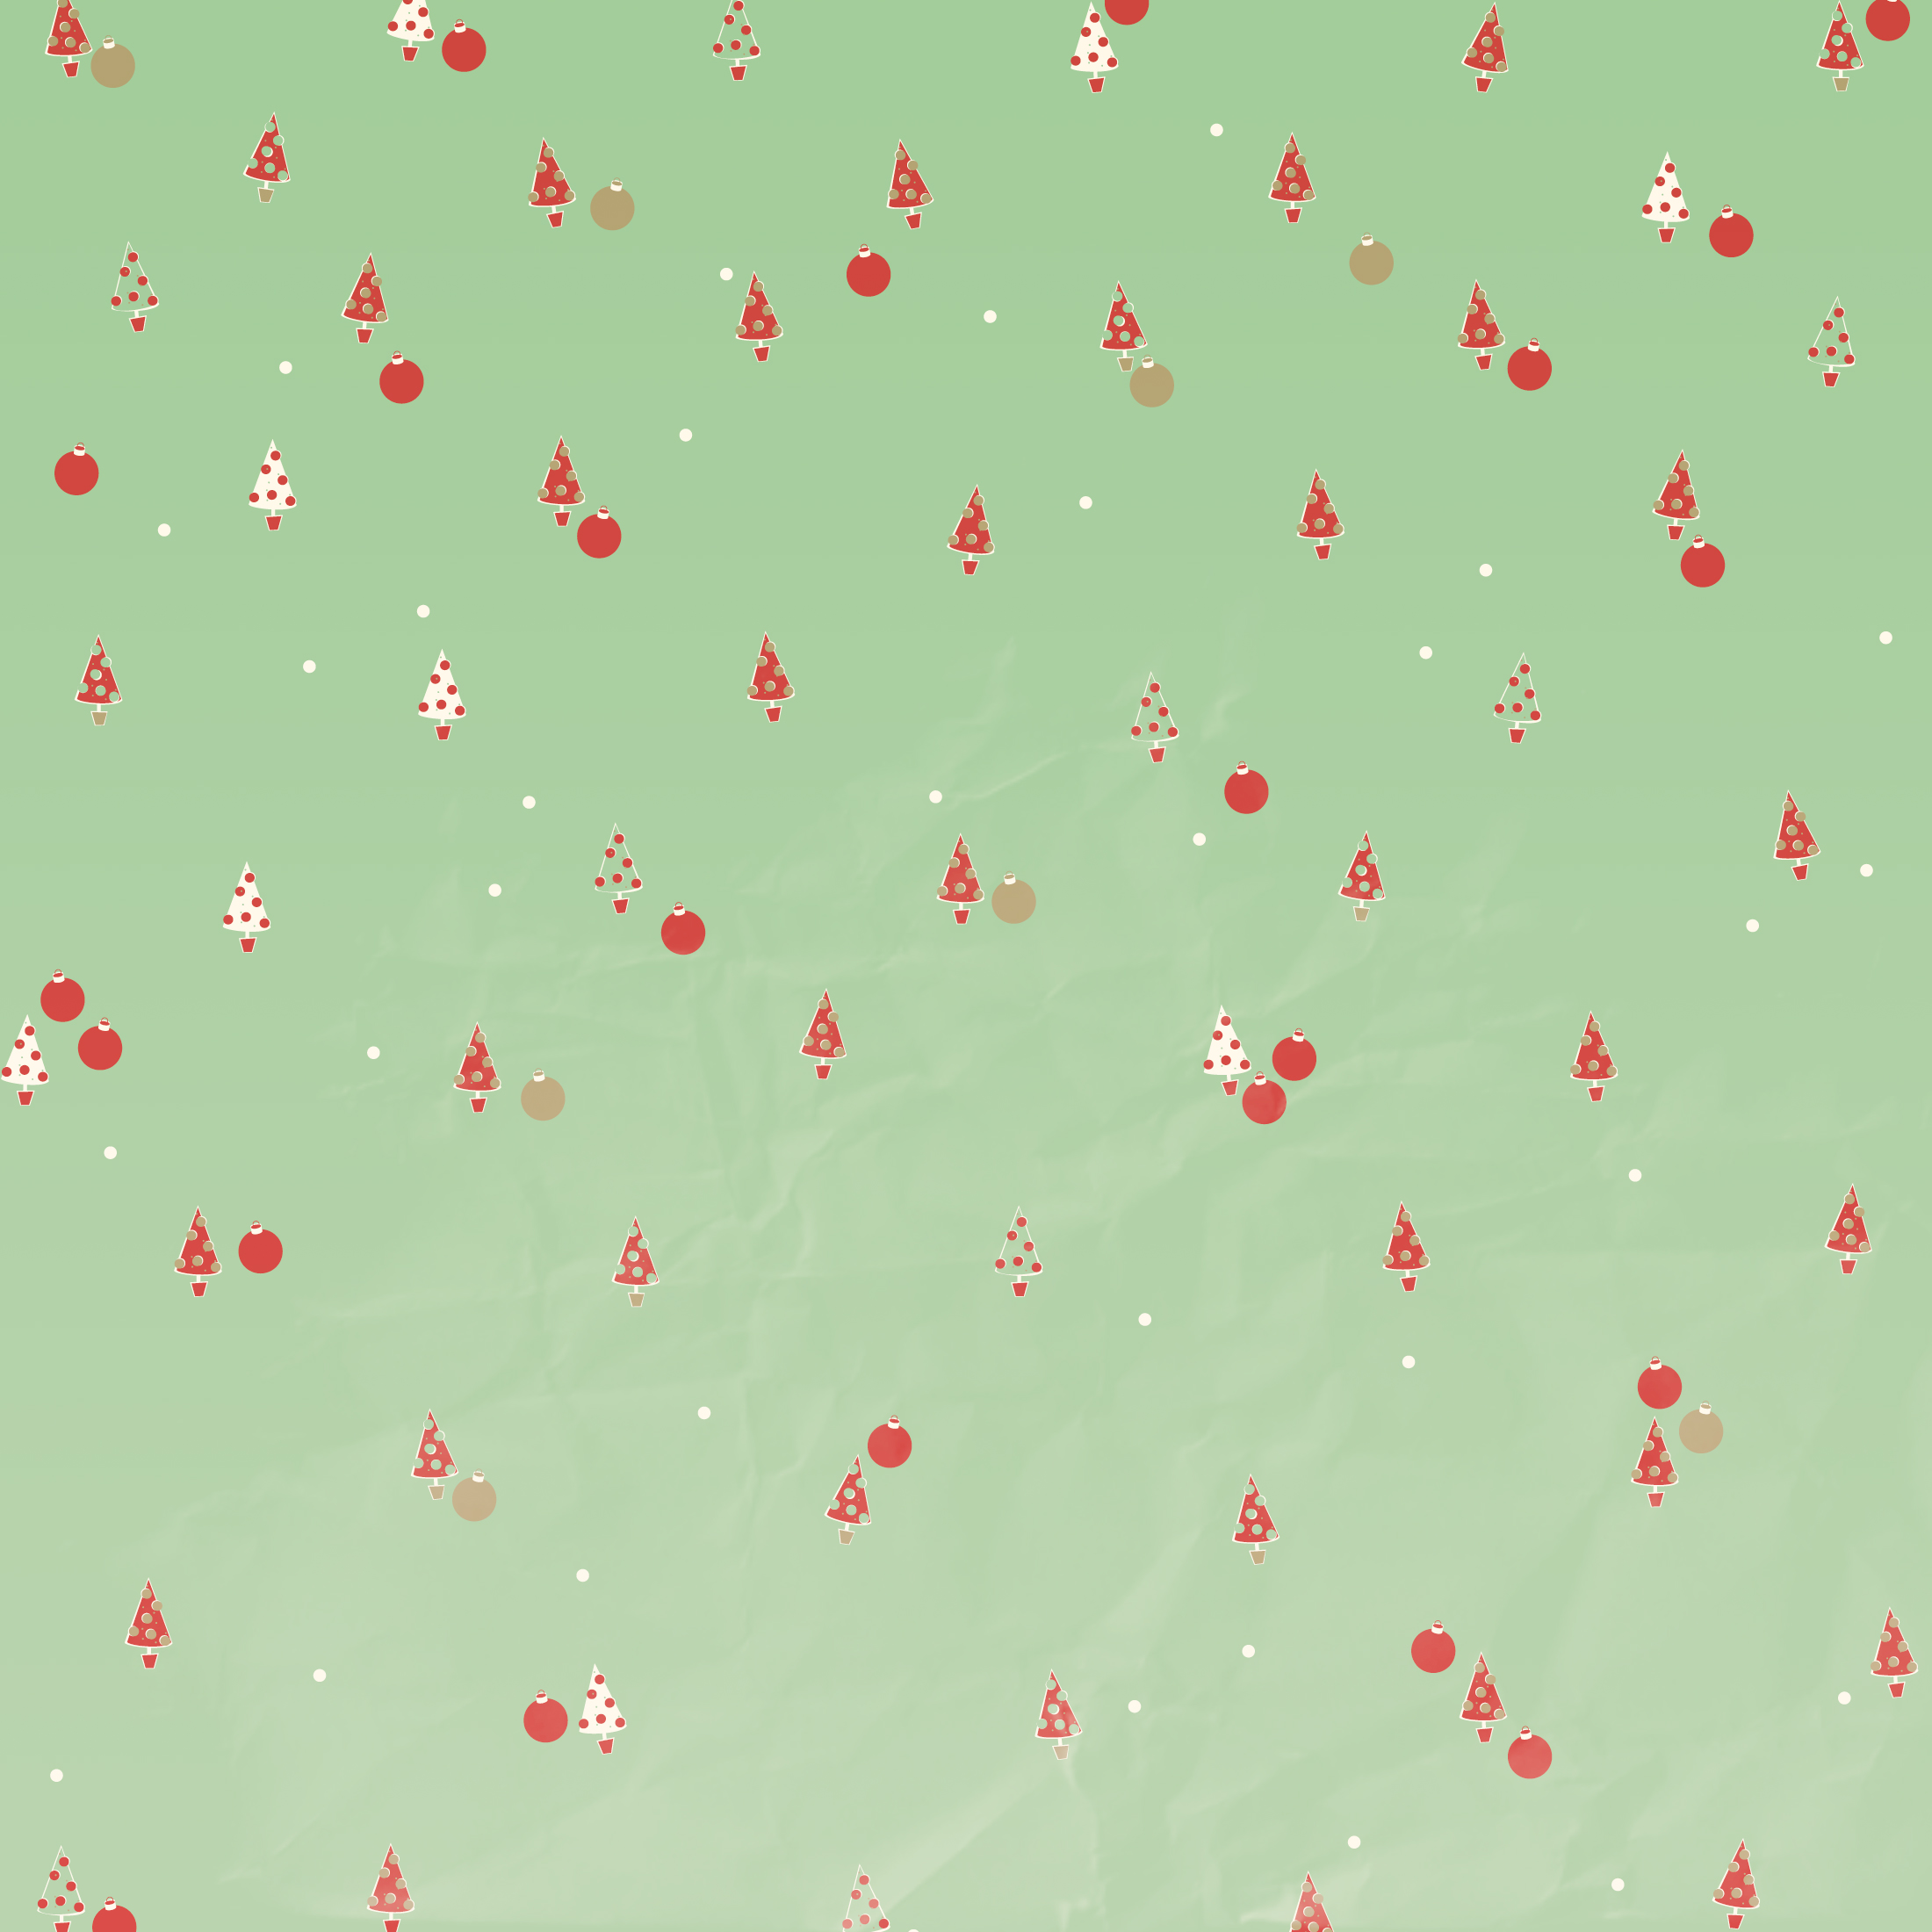 Cute Christmas Backgrounds Tumblr   wwwyuyellowpagesnet 2200x2200